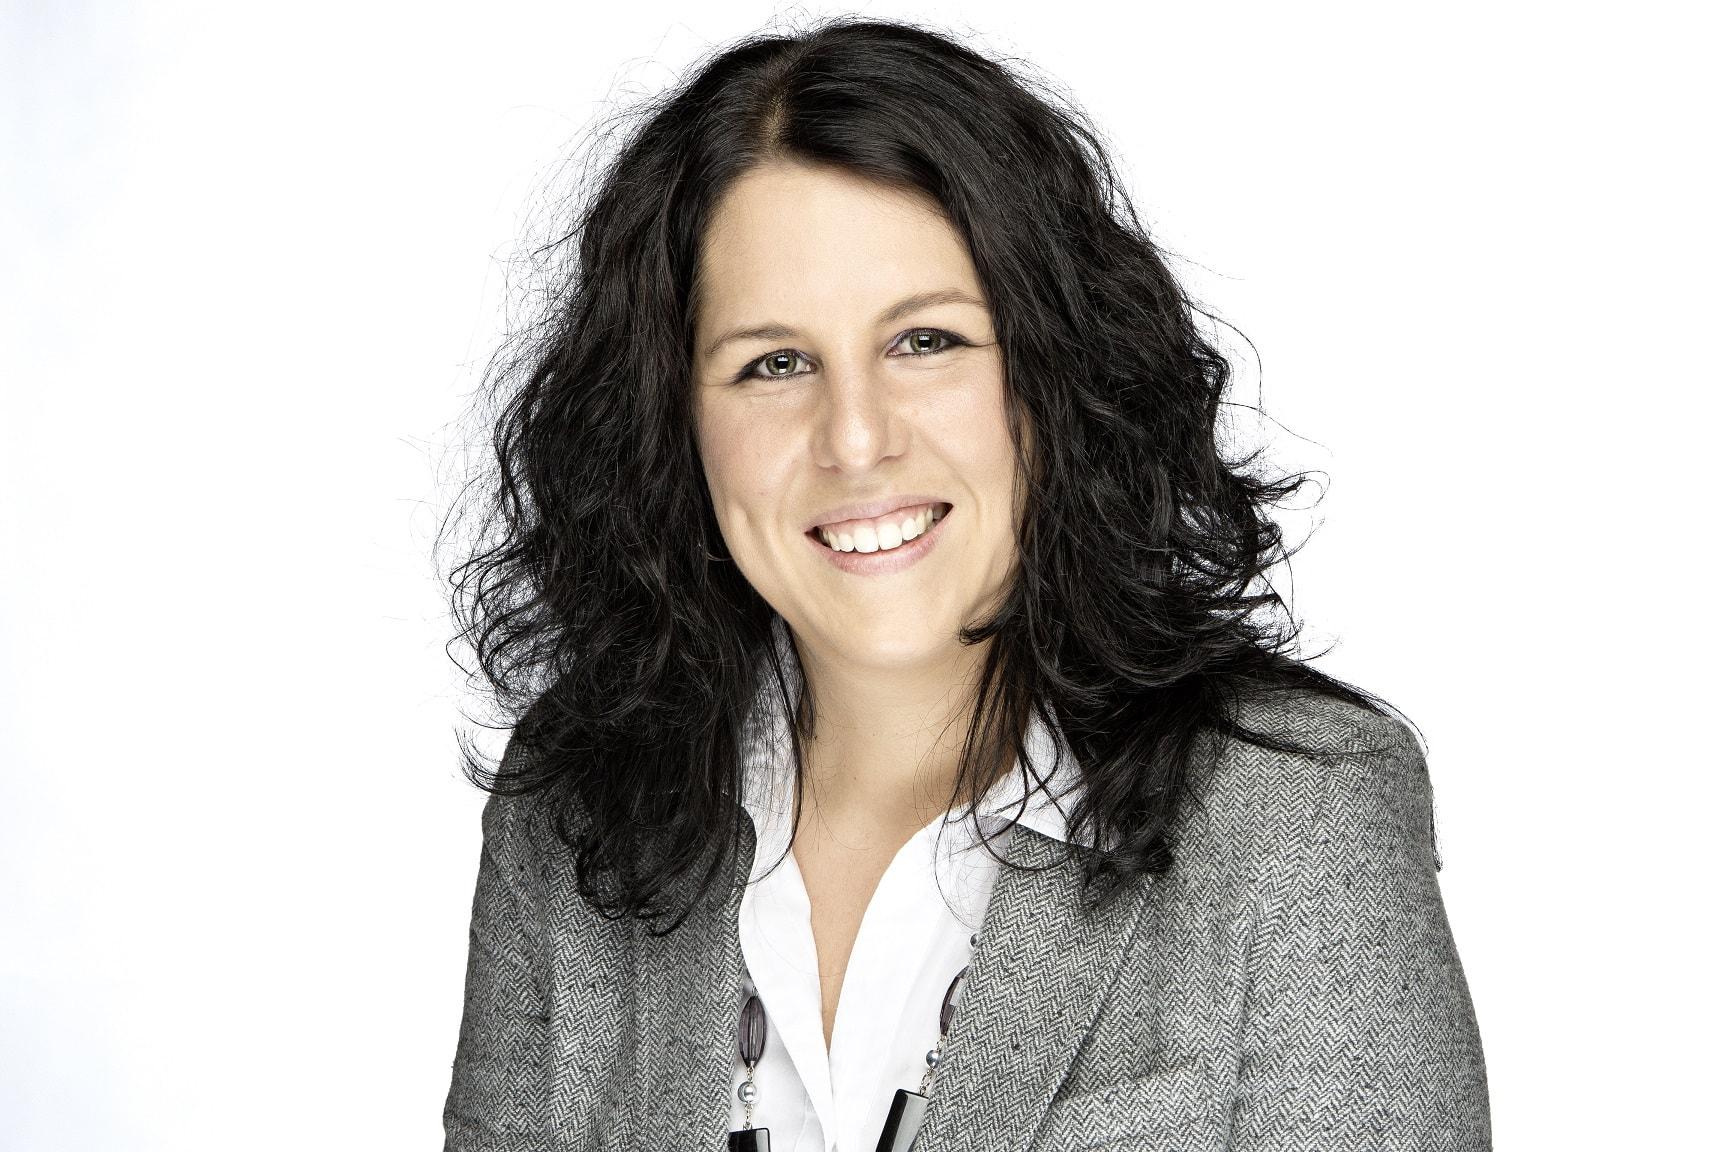 Cornelia Krämer